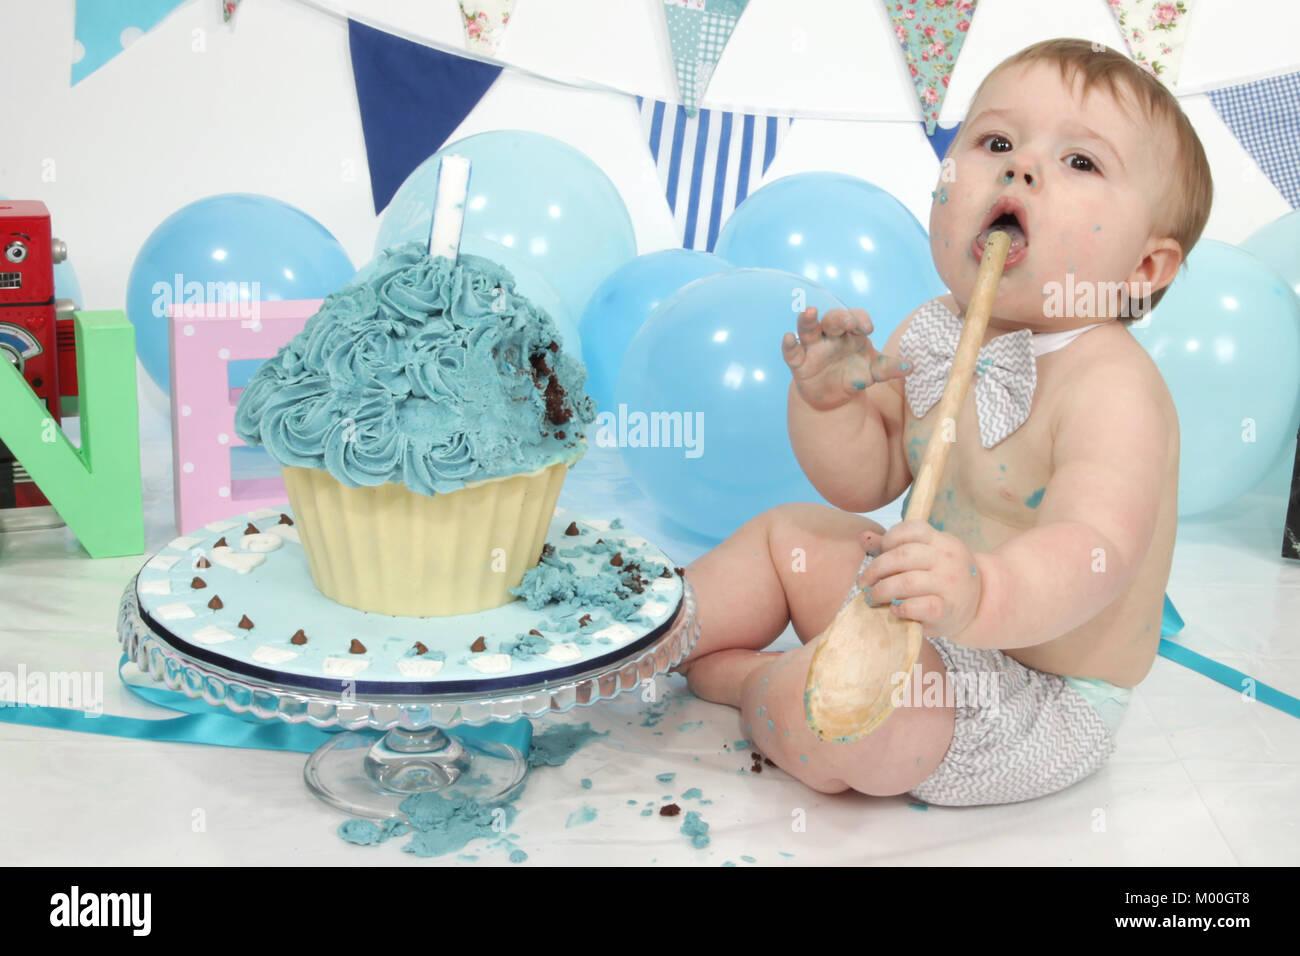 1 Year Old Boy Birthday Party Cake Smash Fun Food Stock